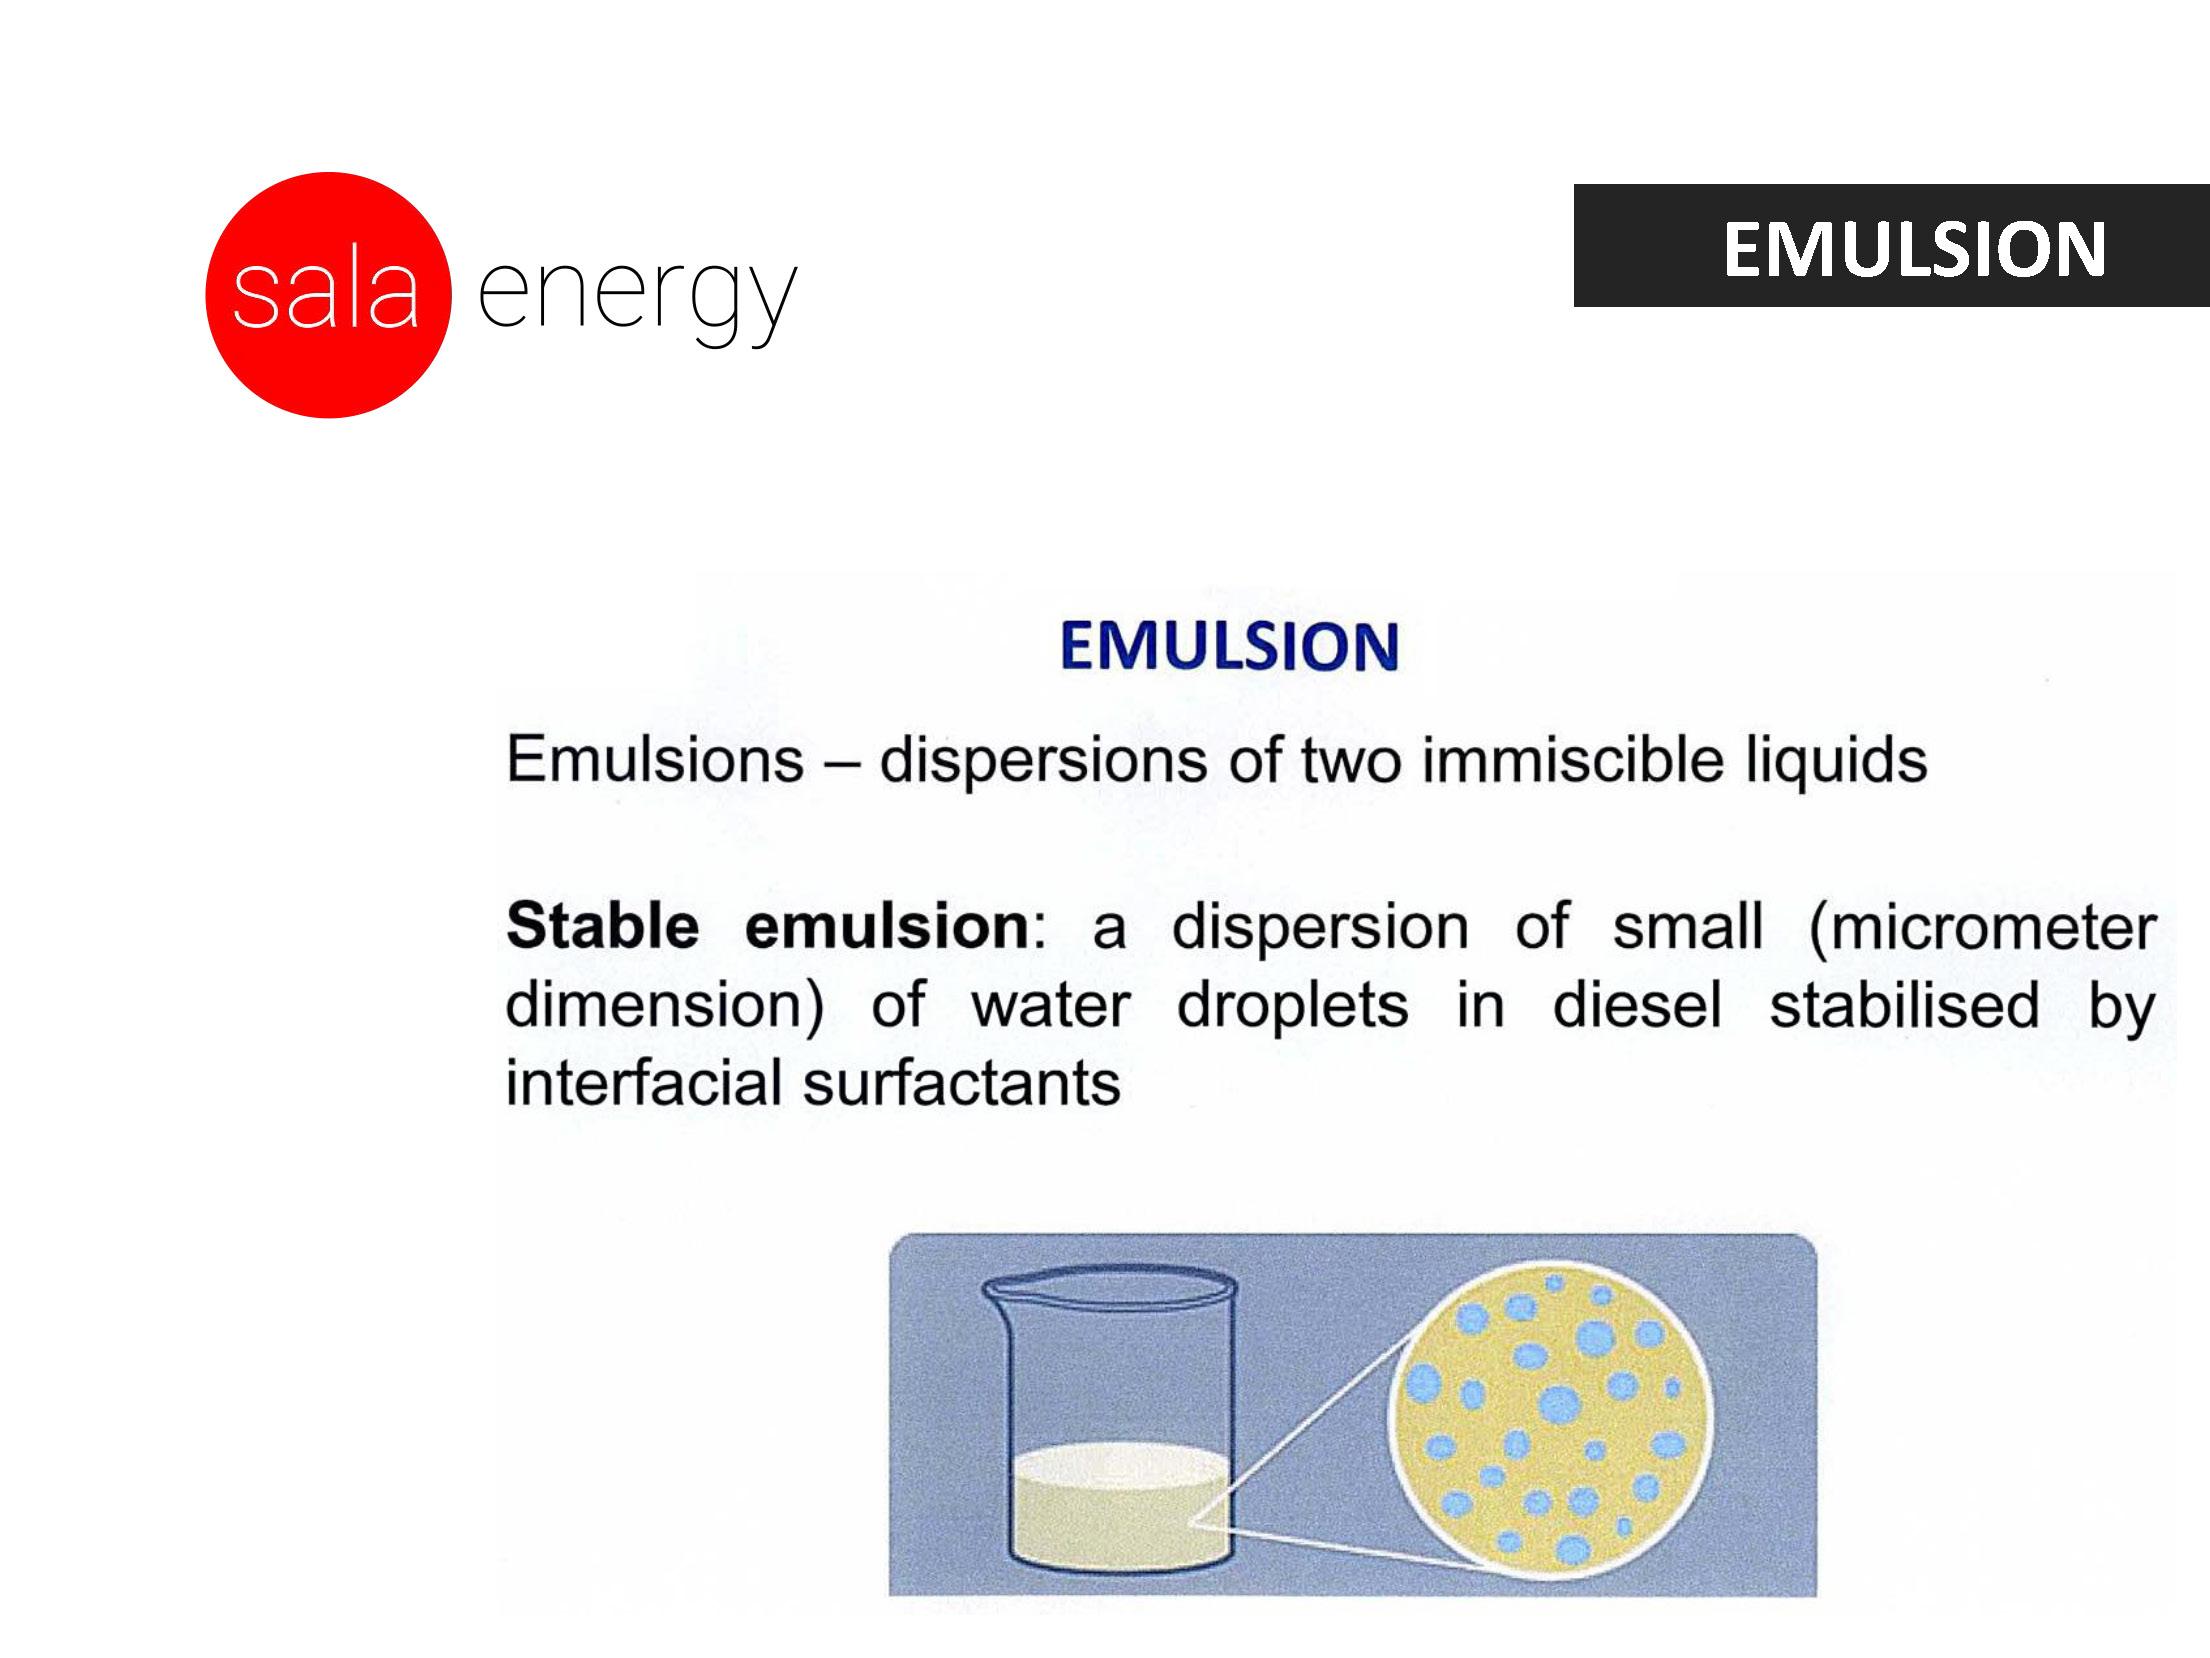 SALA Diesel emulsion 2017_Page_13